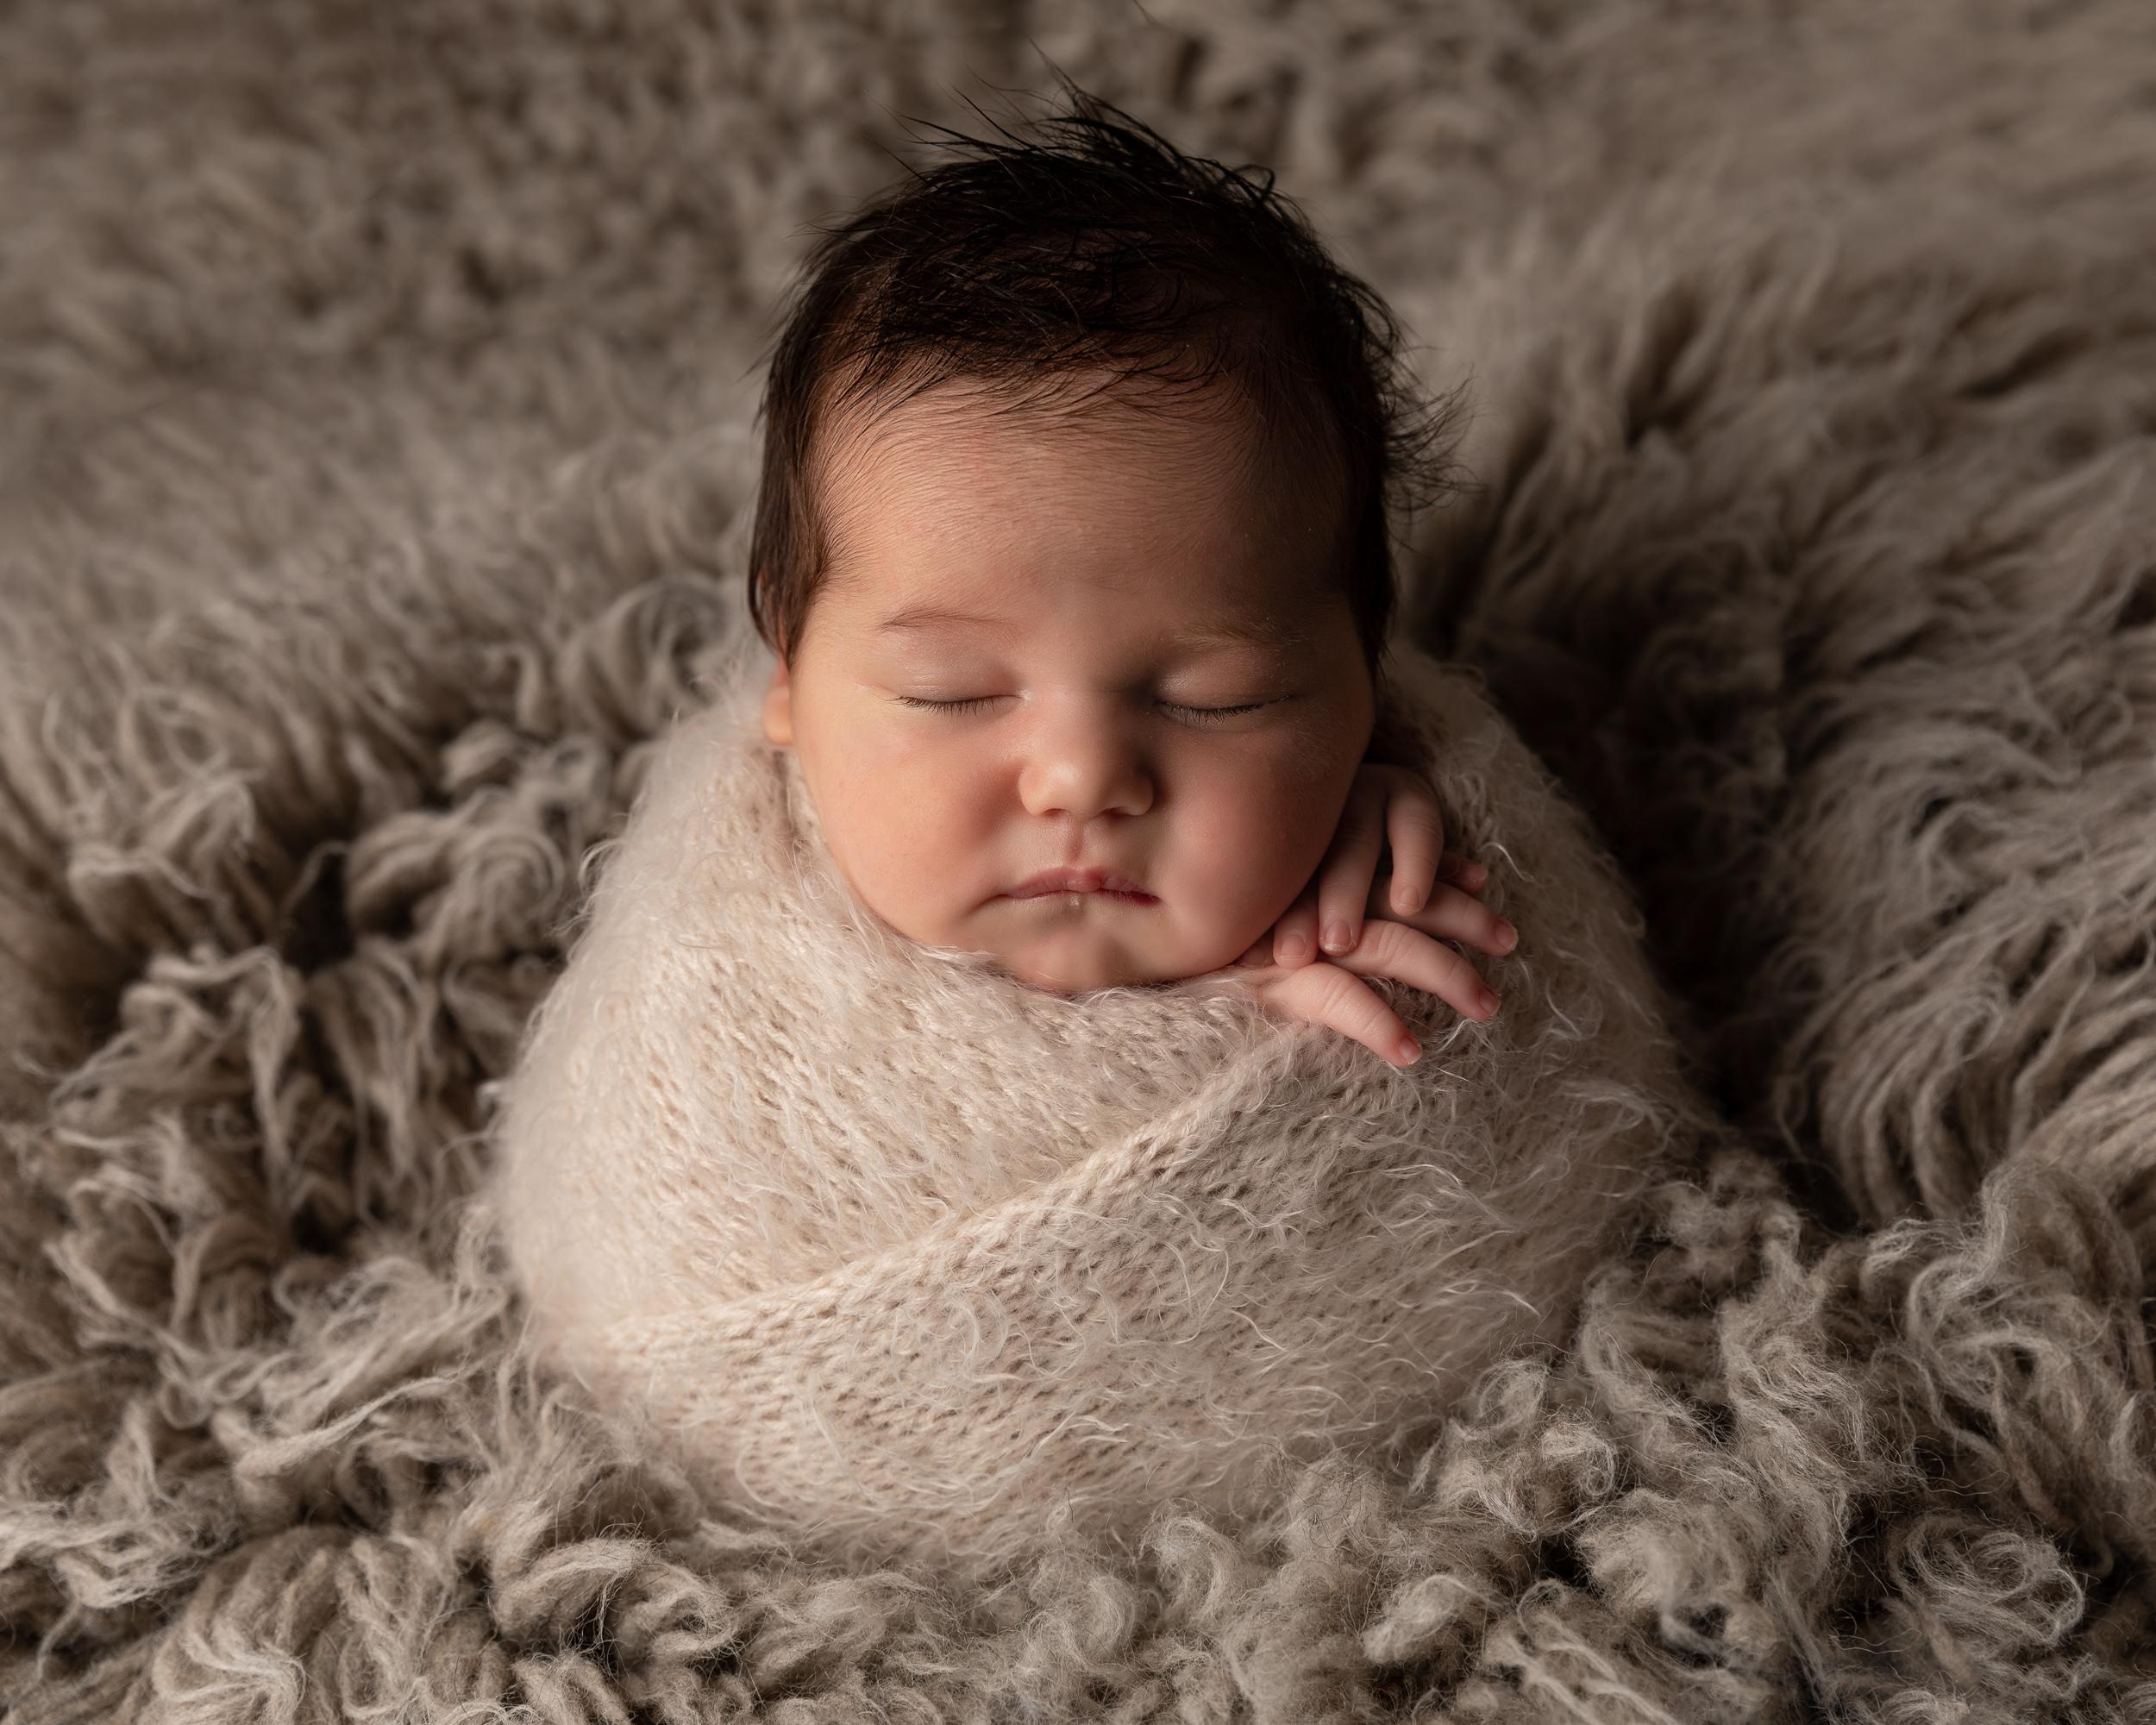 Baby girl in potato sack pose by Cheshire newborn photographer in Sandbach